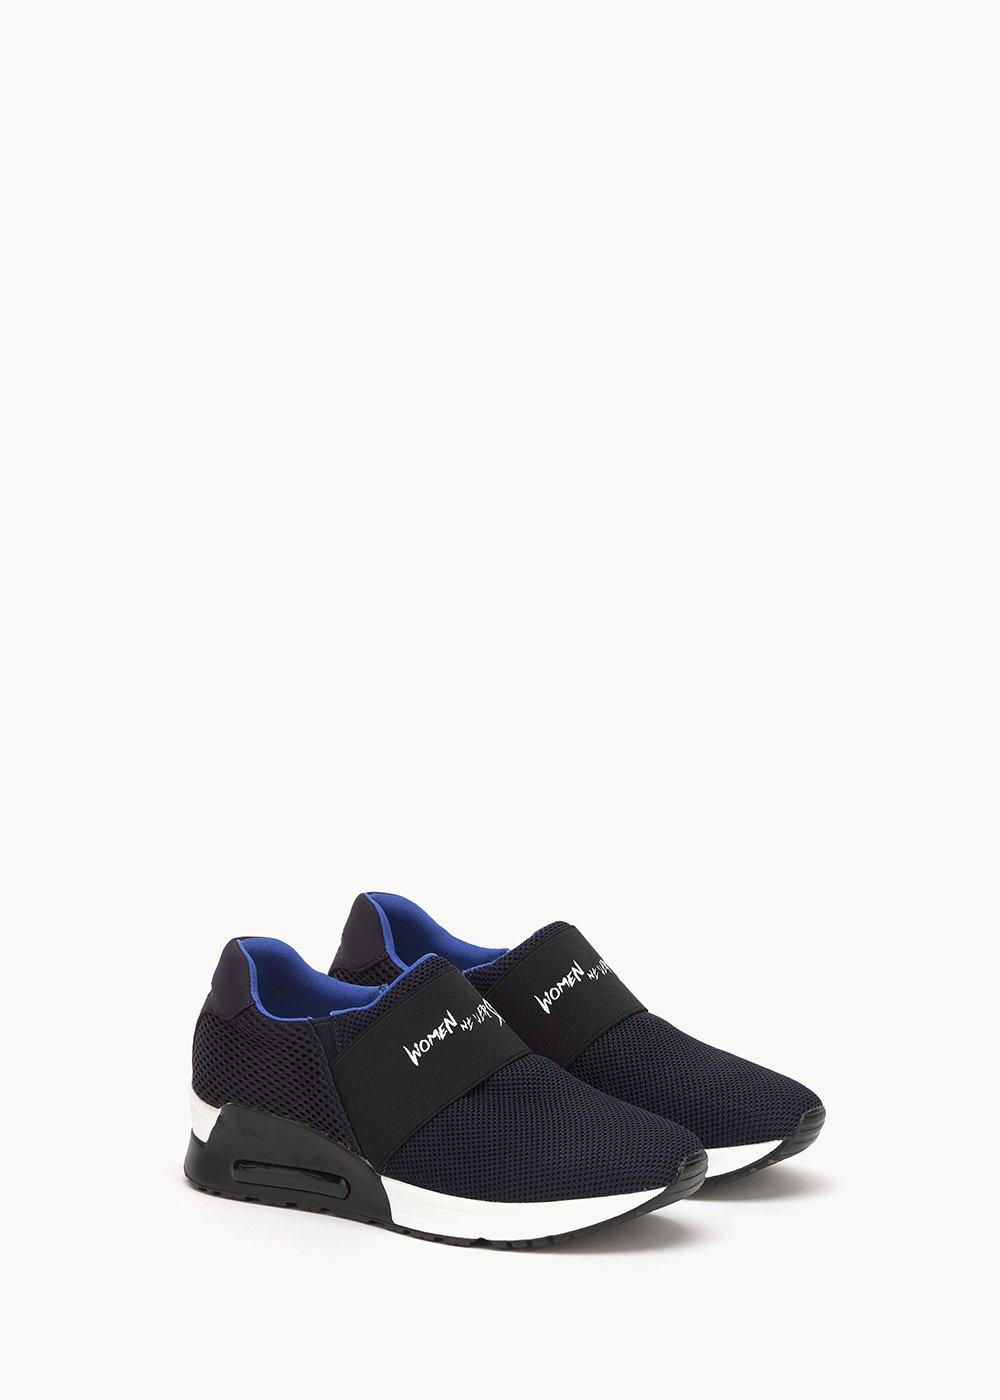 Sakir sneakers with elastic band - Medium Blue / Nettuno - Woman